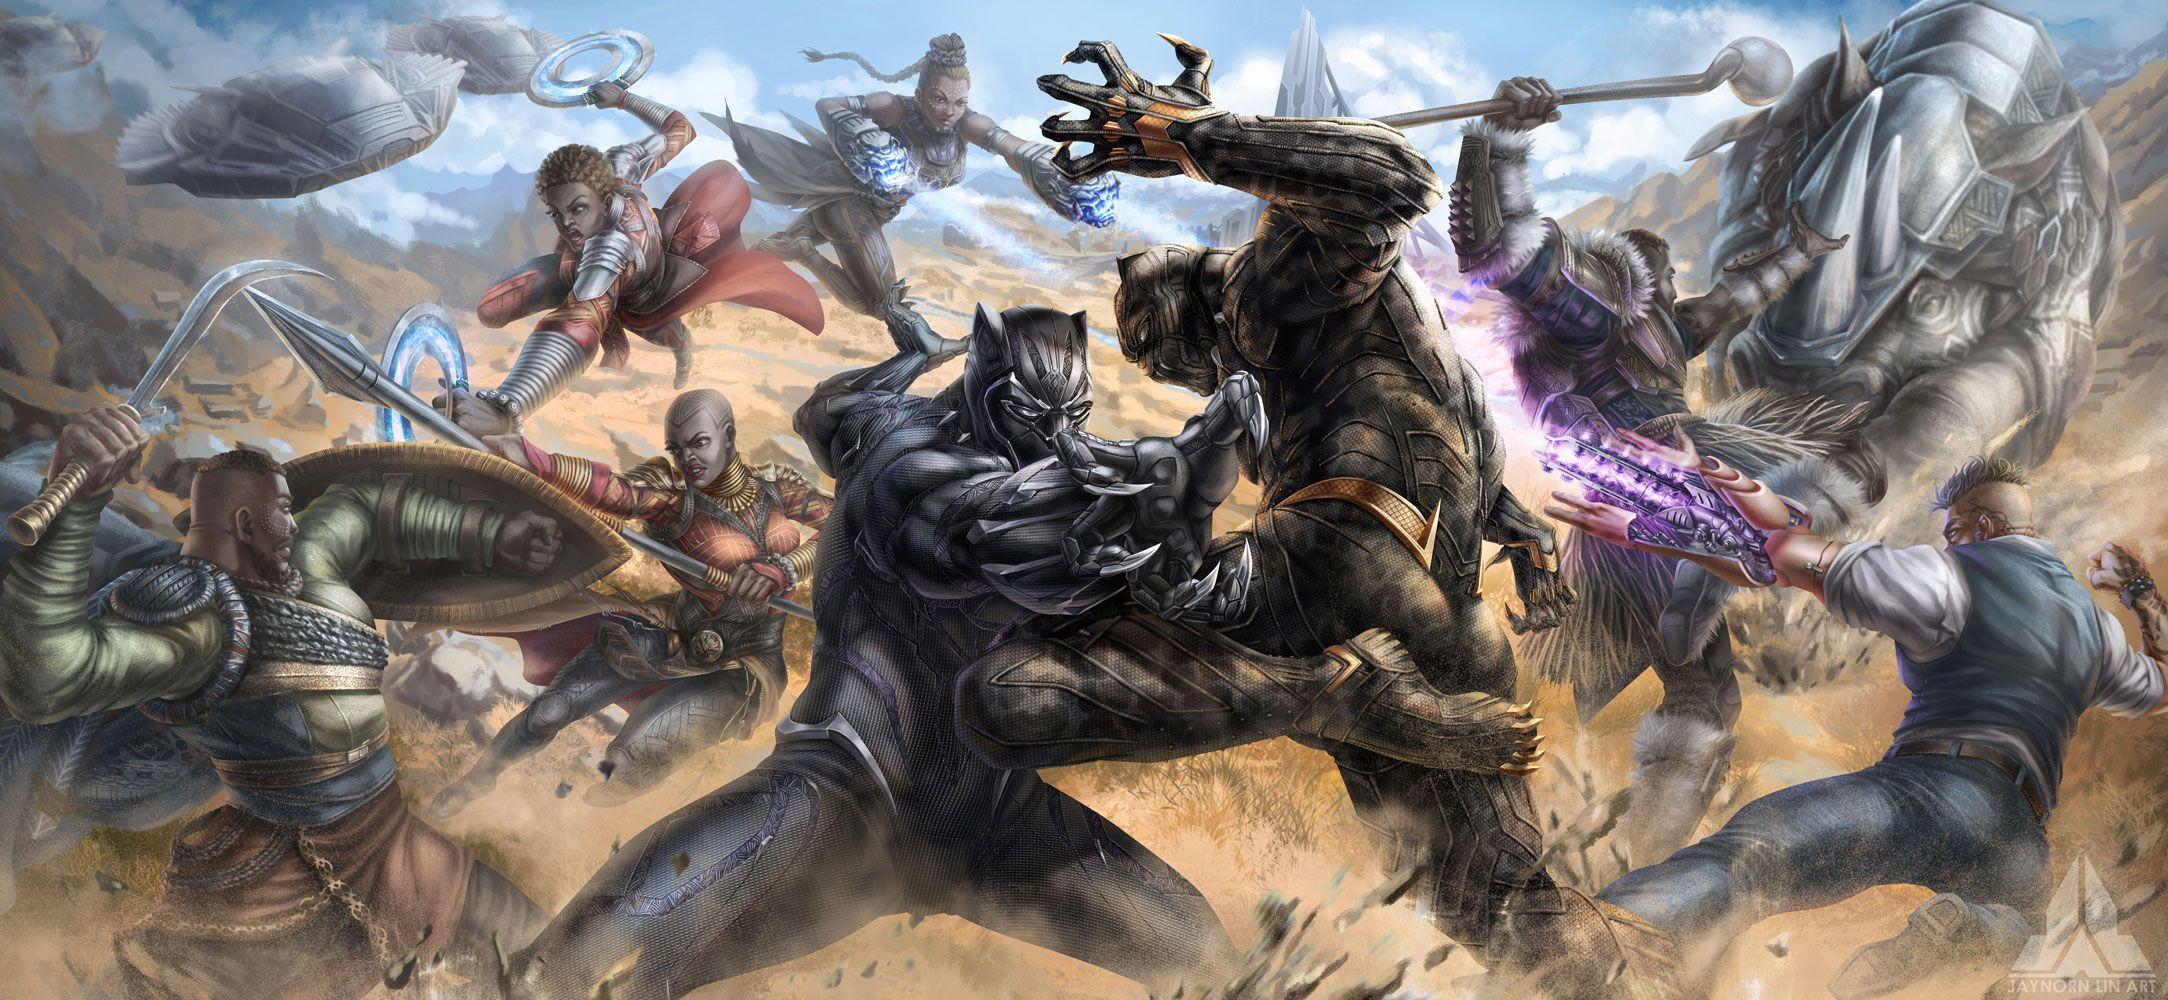 Black Panther T Challa Killmonger Nakia Okoye W Kabi Shuri M Baku Ulysses Klaue Rhinoceros Marvel Fana Black Panther Panther Pictures Avengers Cartoon